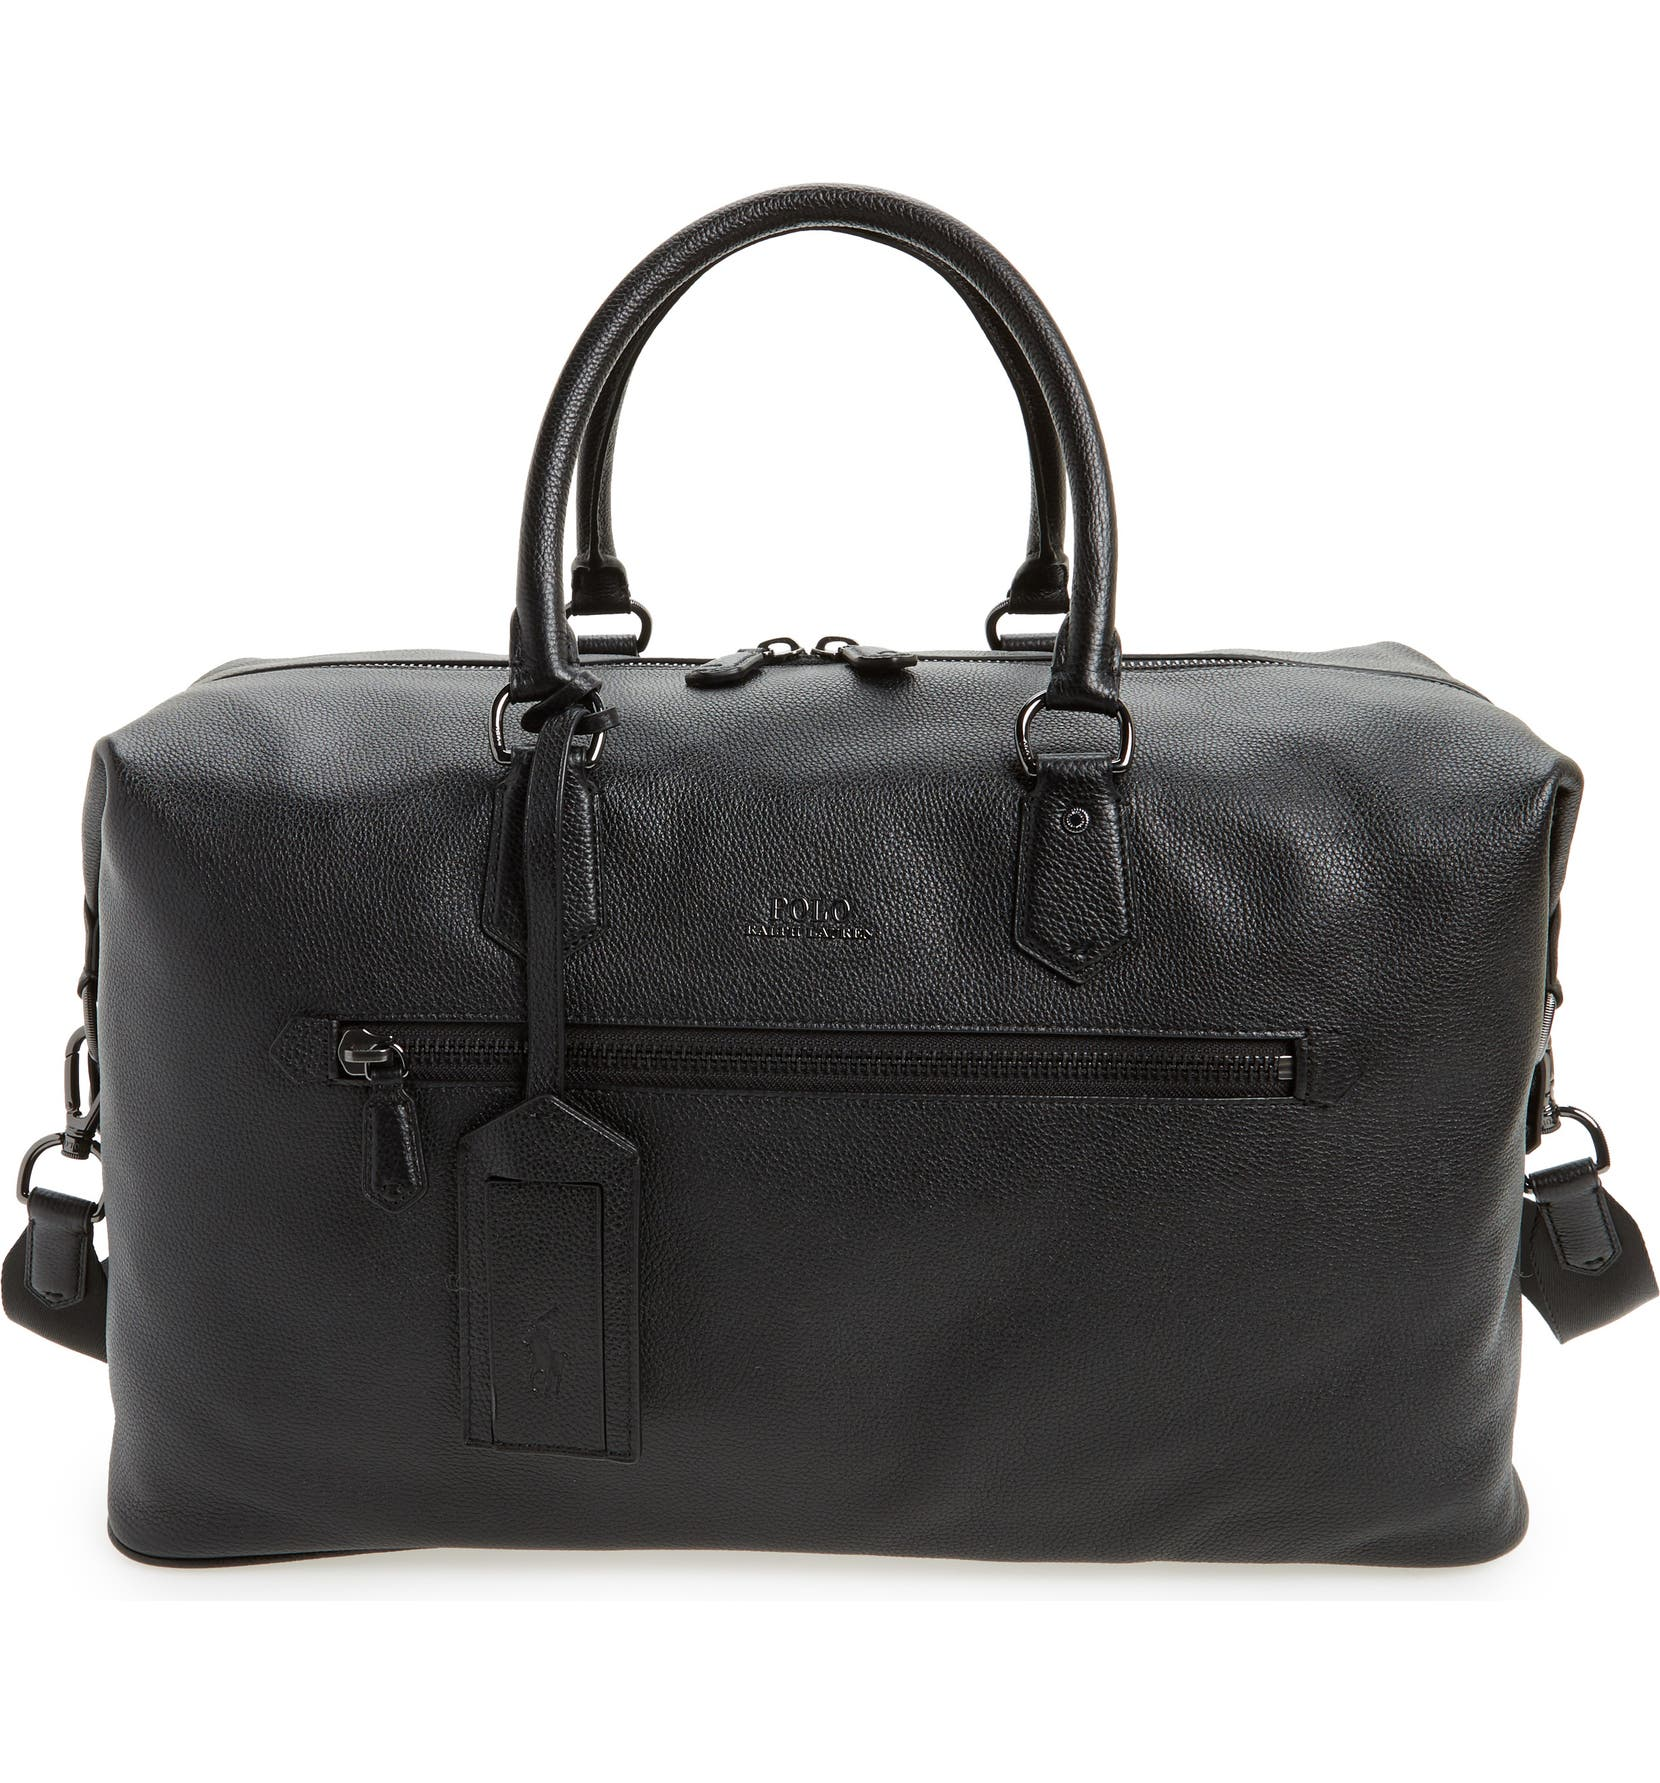 Polo Ralph Lauren Pebbled Leather Duffel Bag  93ad69a4fedb2